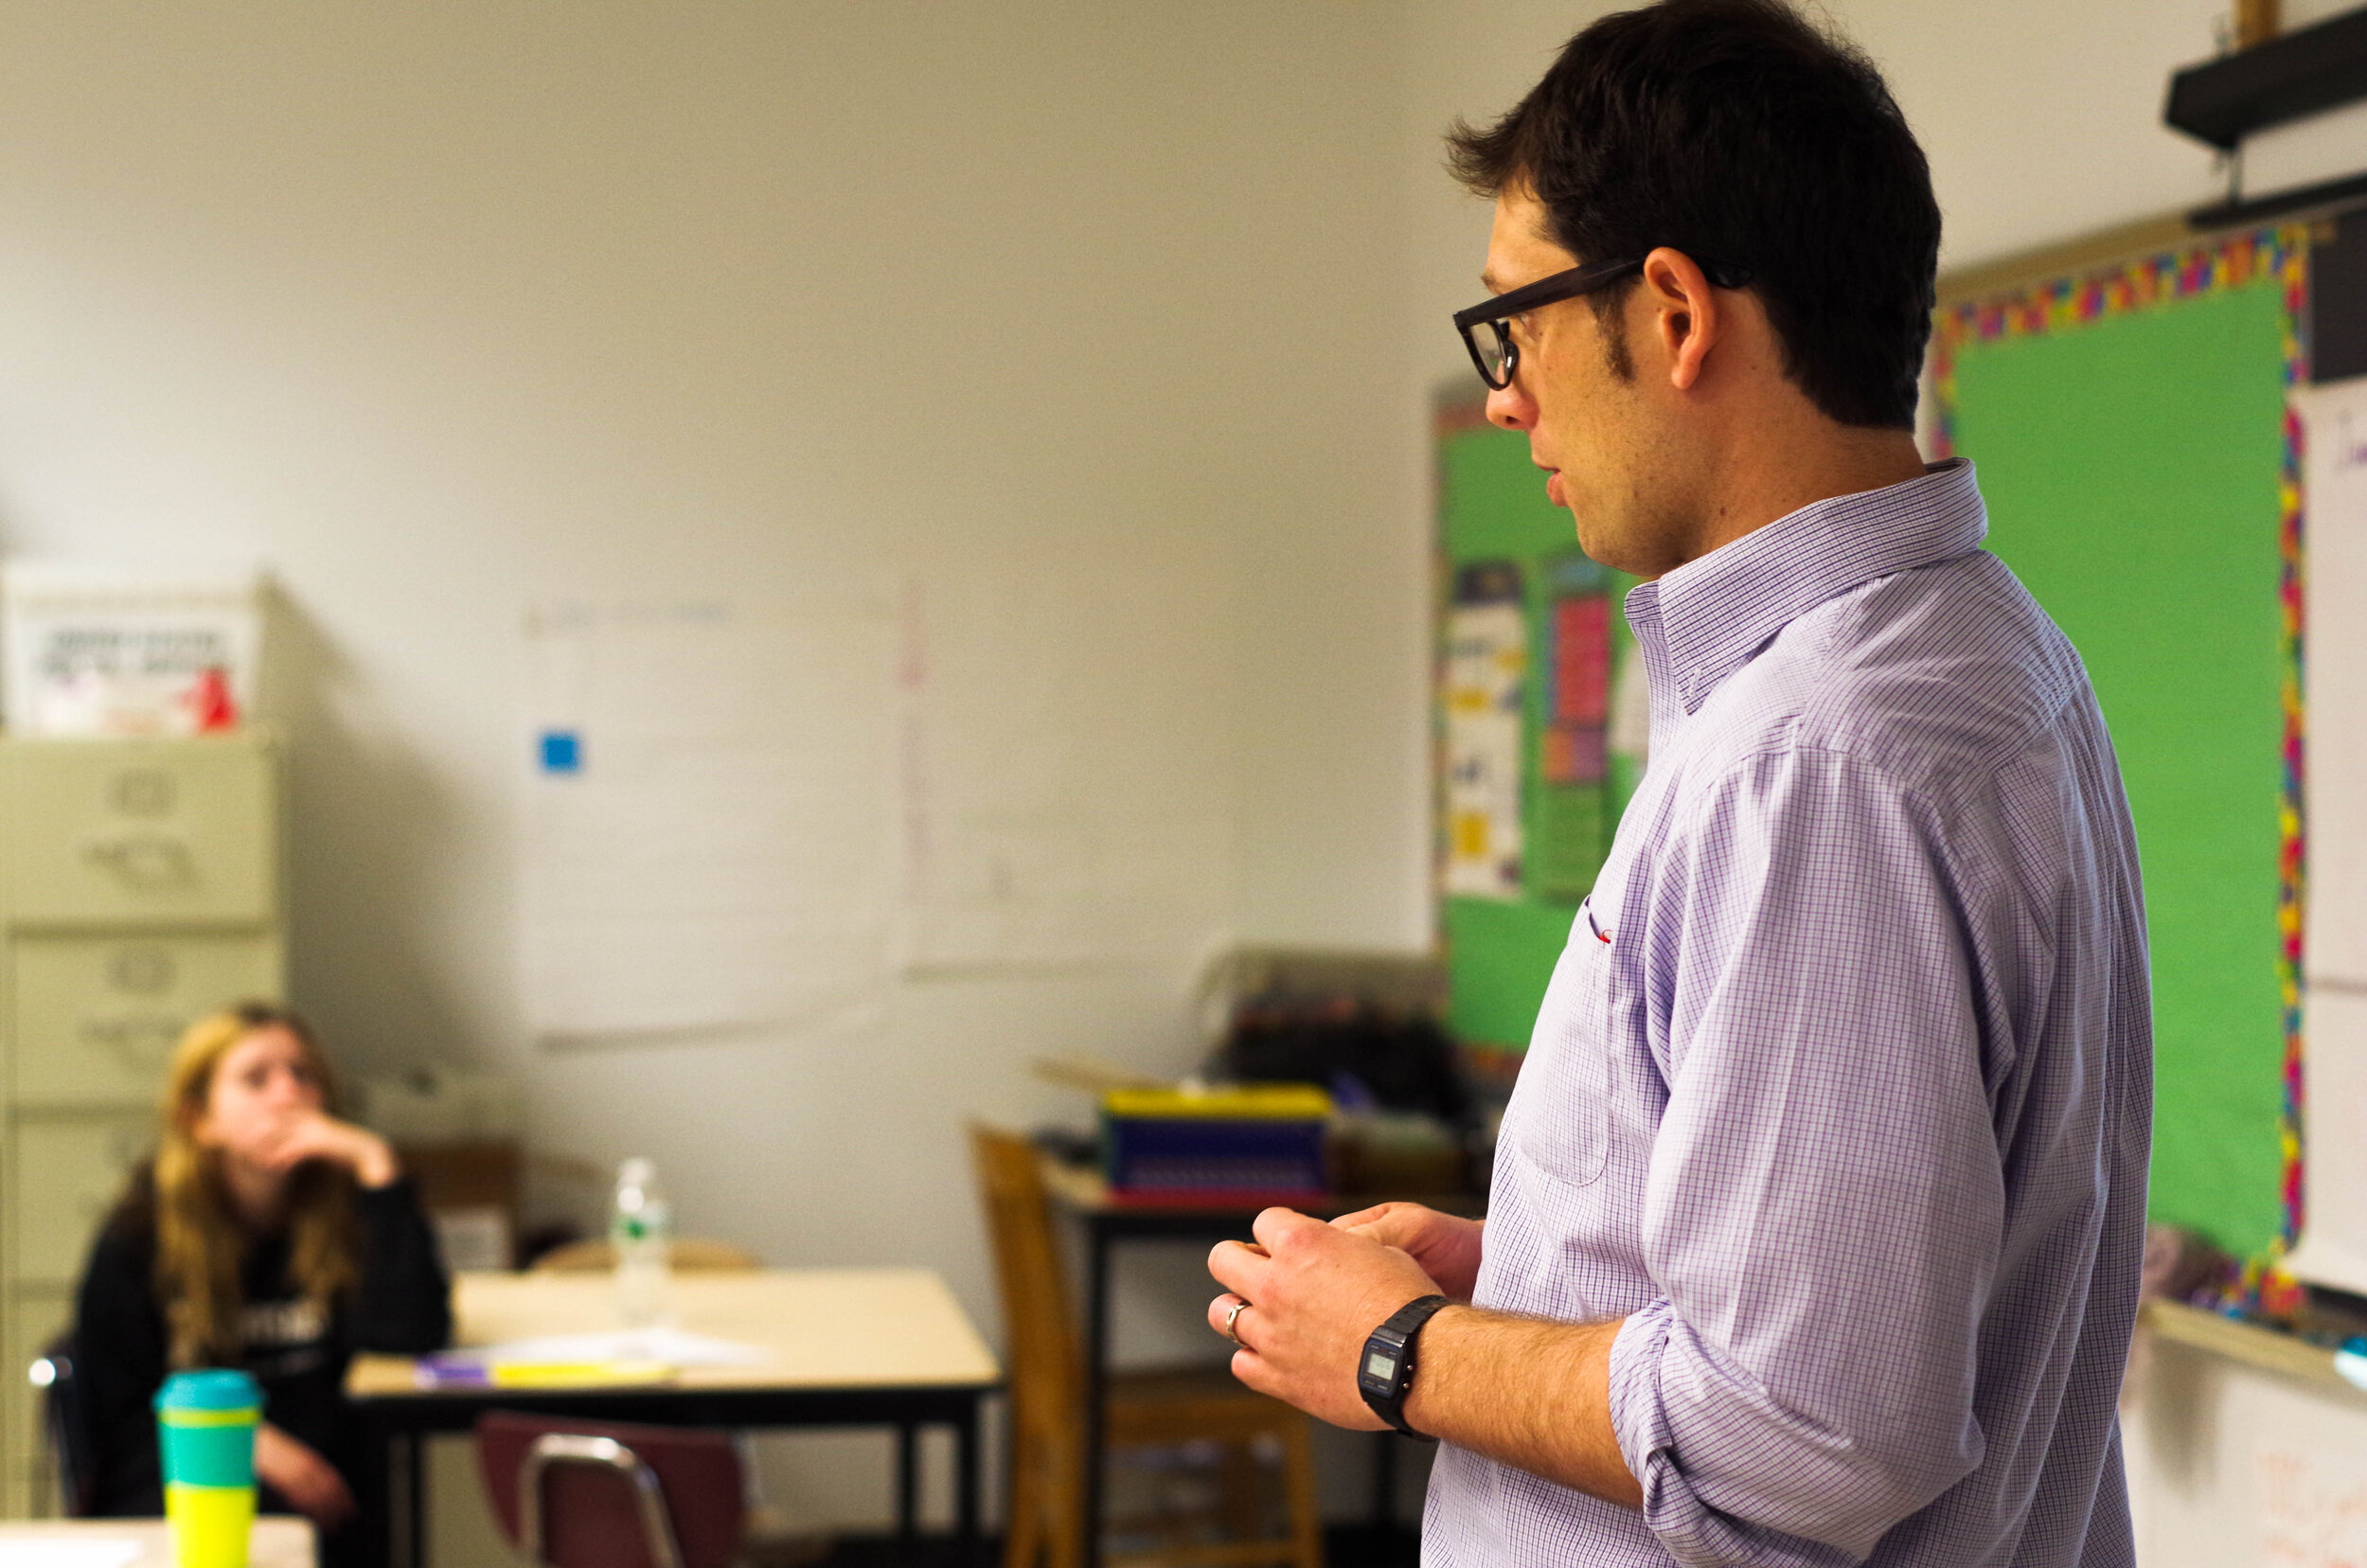 America Achieves Fellow John McCrann used his experience teaching high school math to write a regular blog for Education Week.